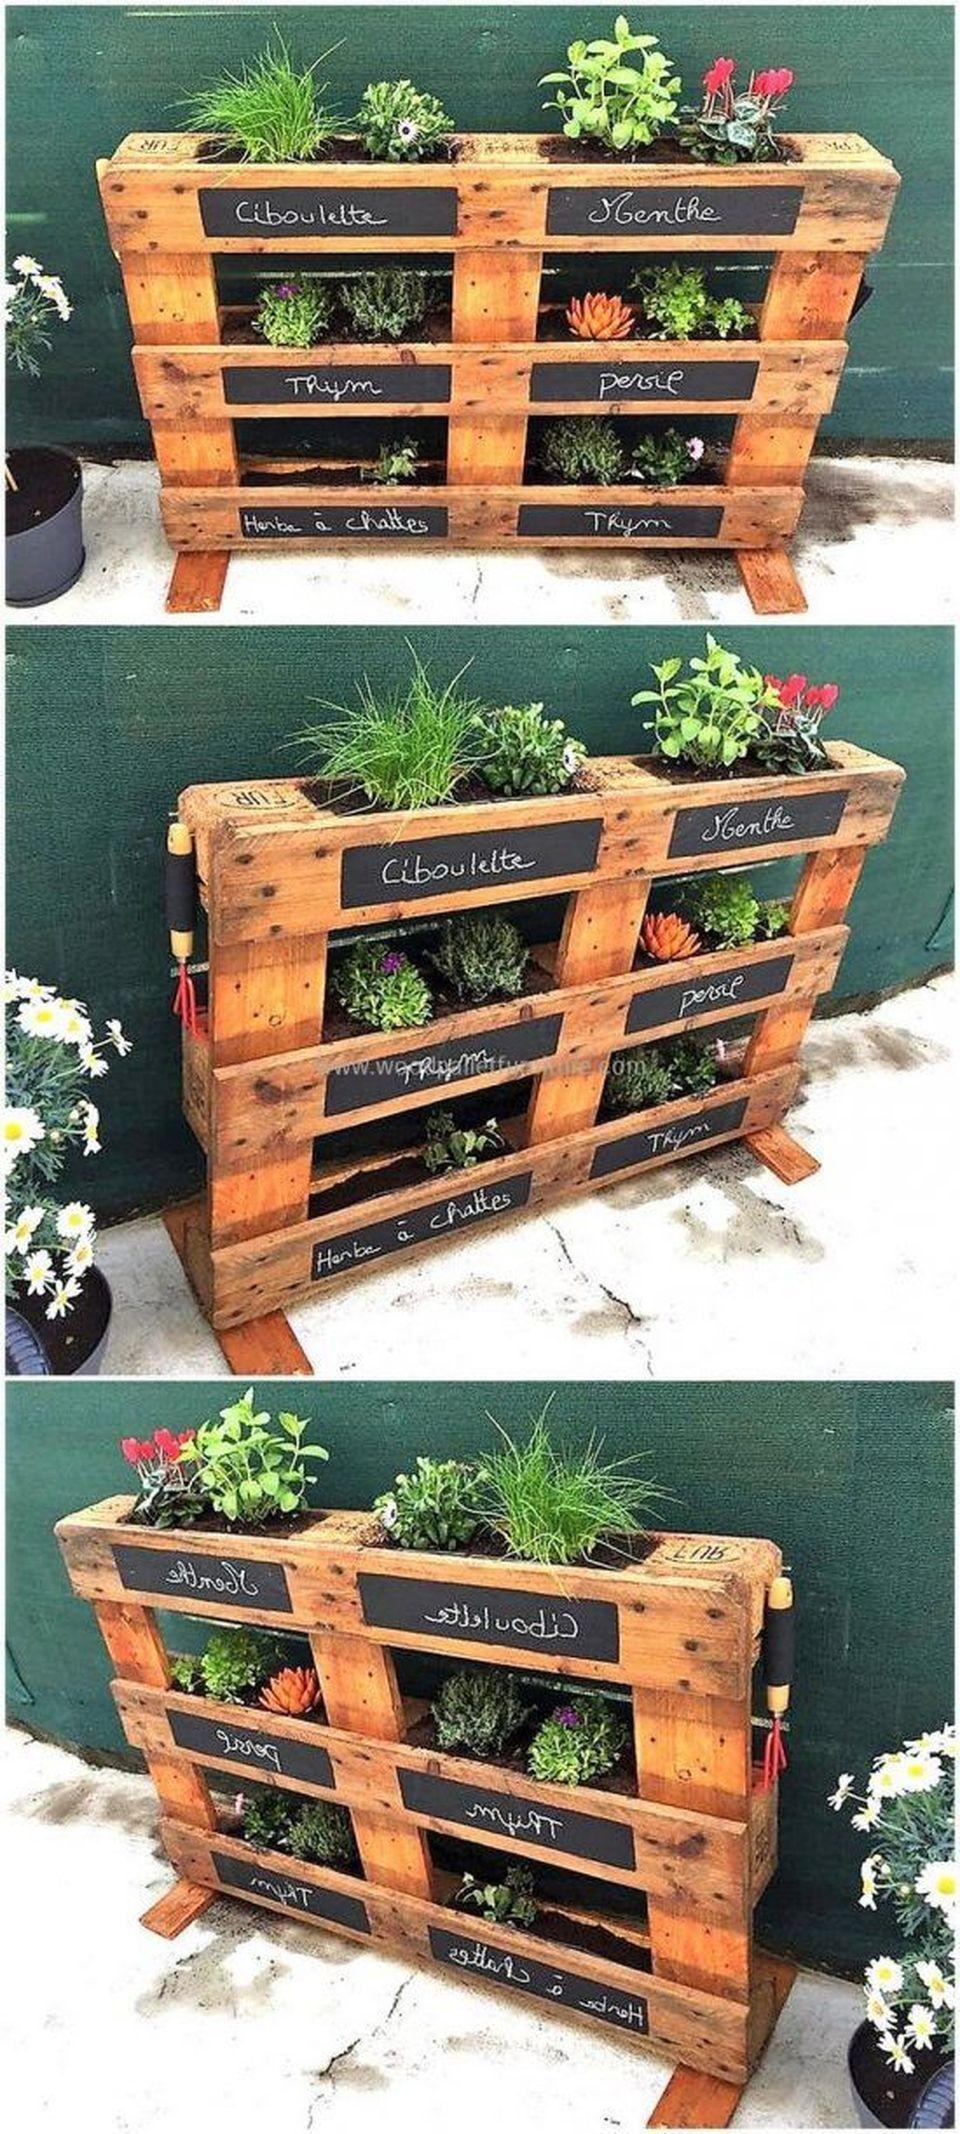 60 Amazing Creative Wood Pallet Garden Project Ideas 400 x 300